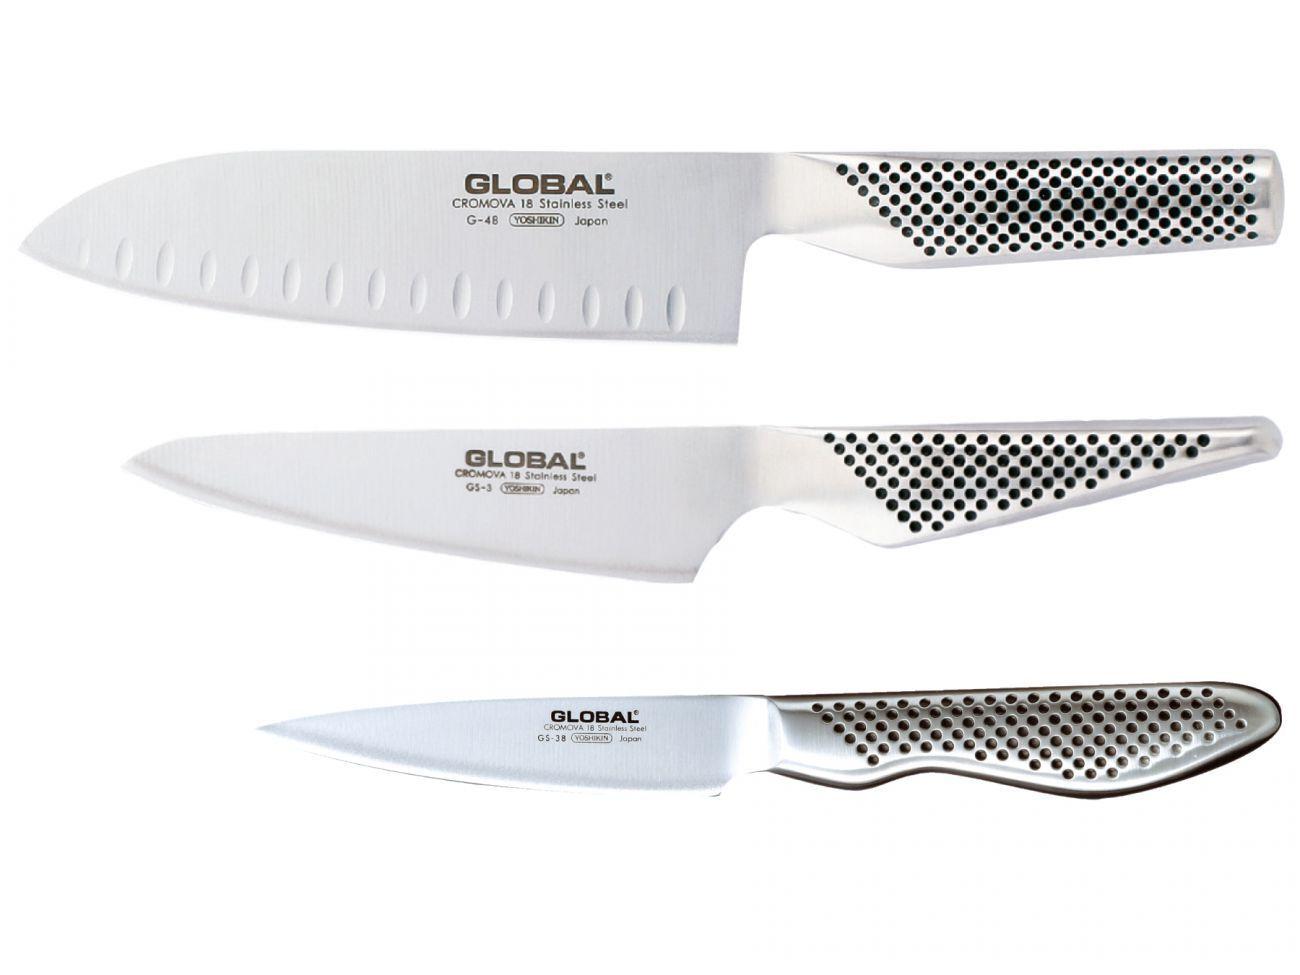 Global G-48338 Messerset Küchenmesserset Edelstahl rostfrei Japan